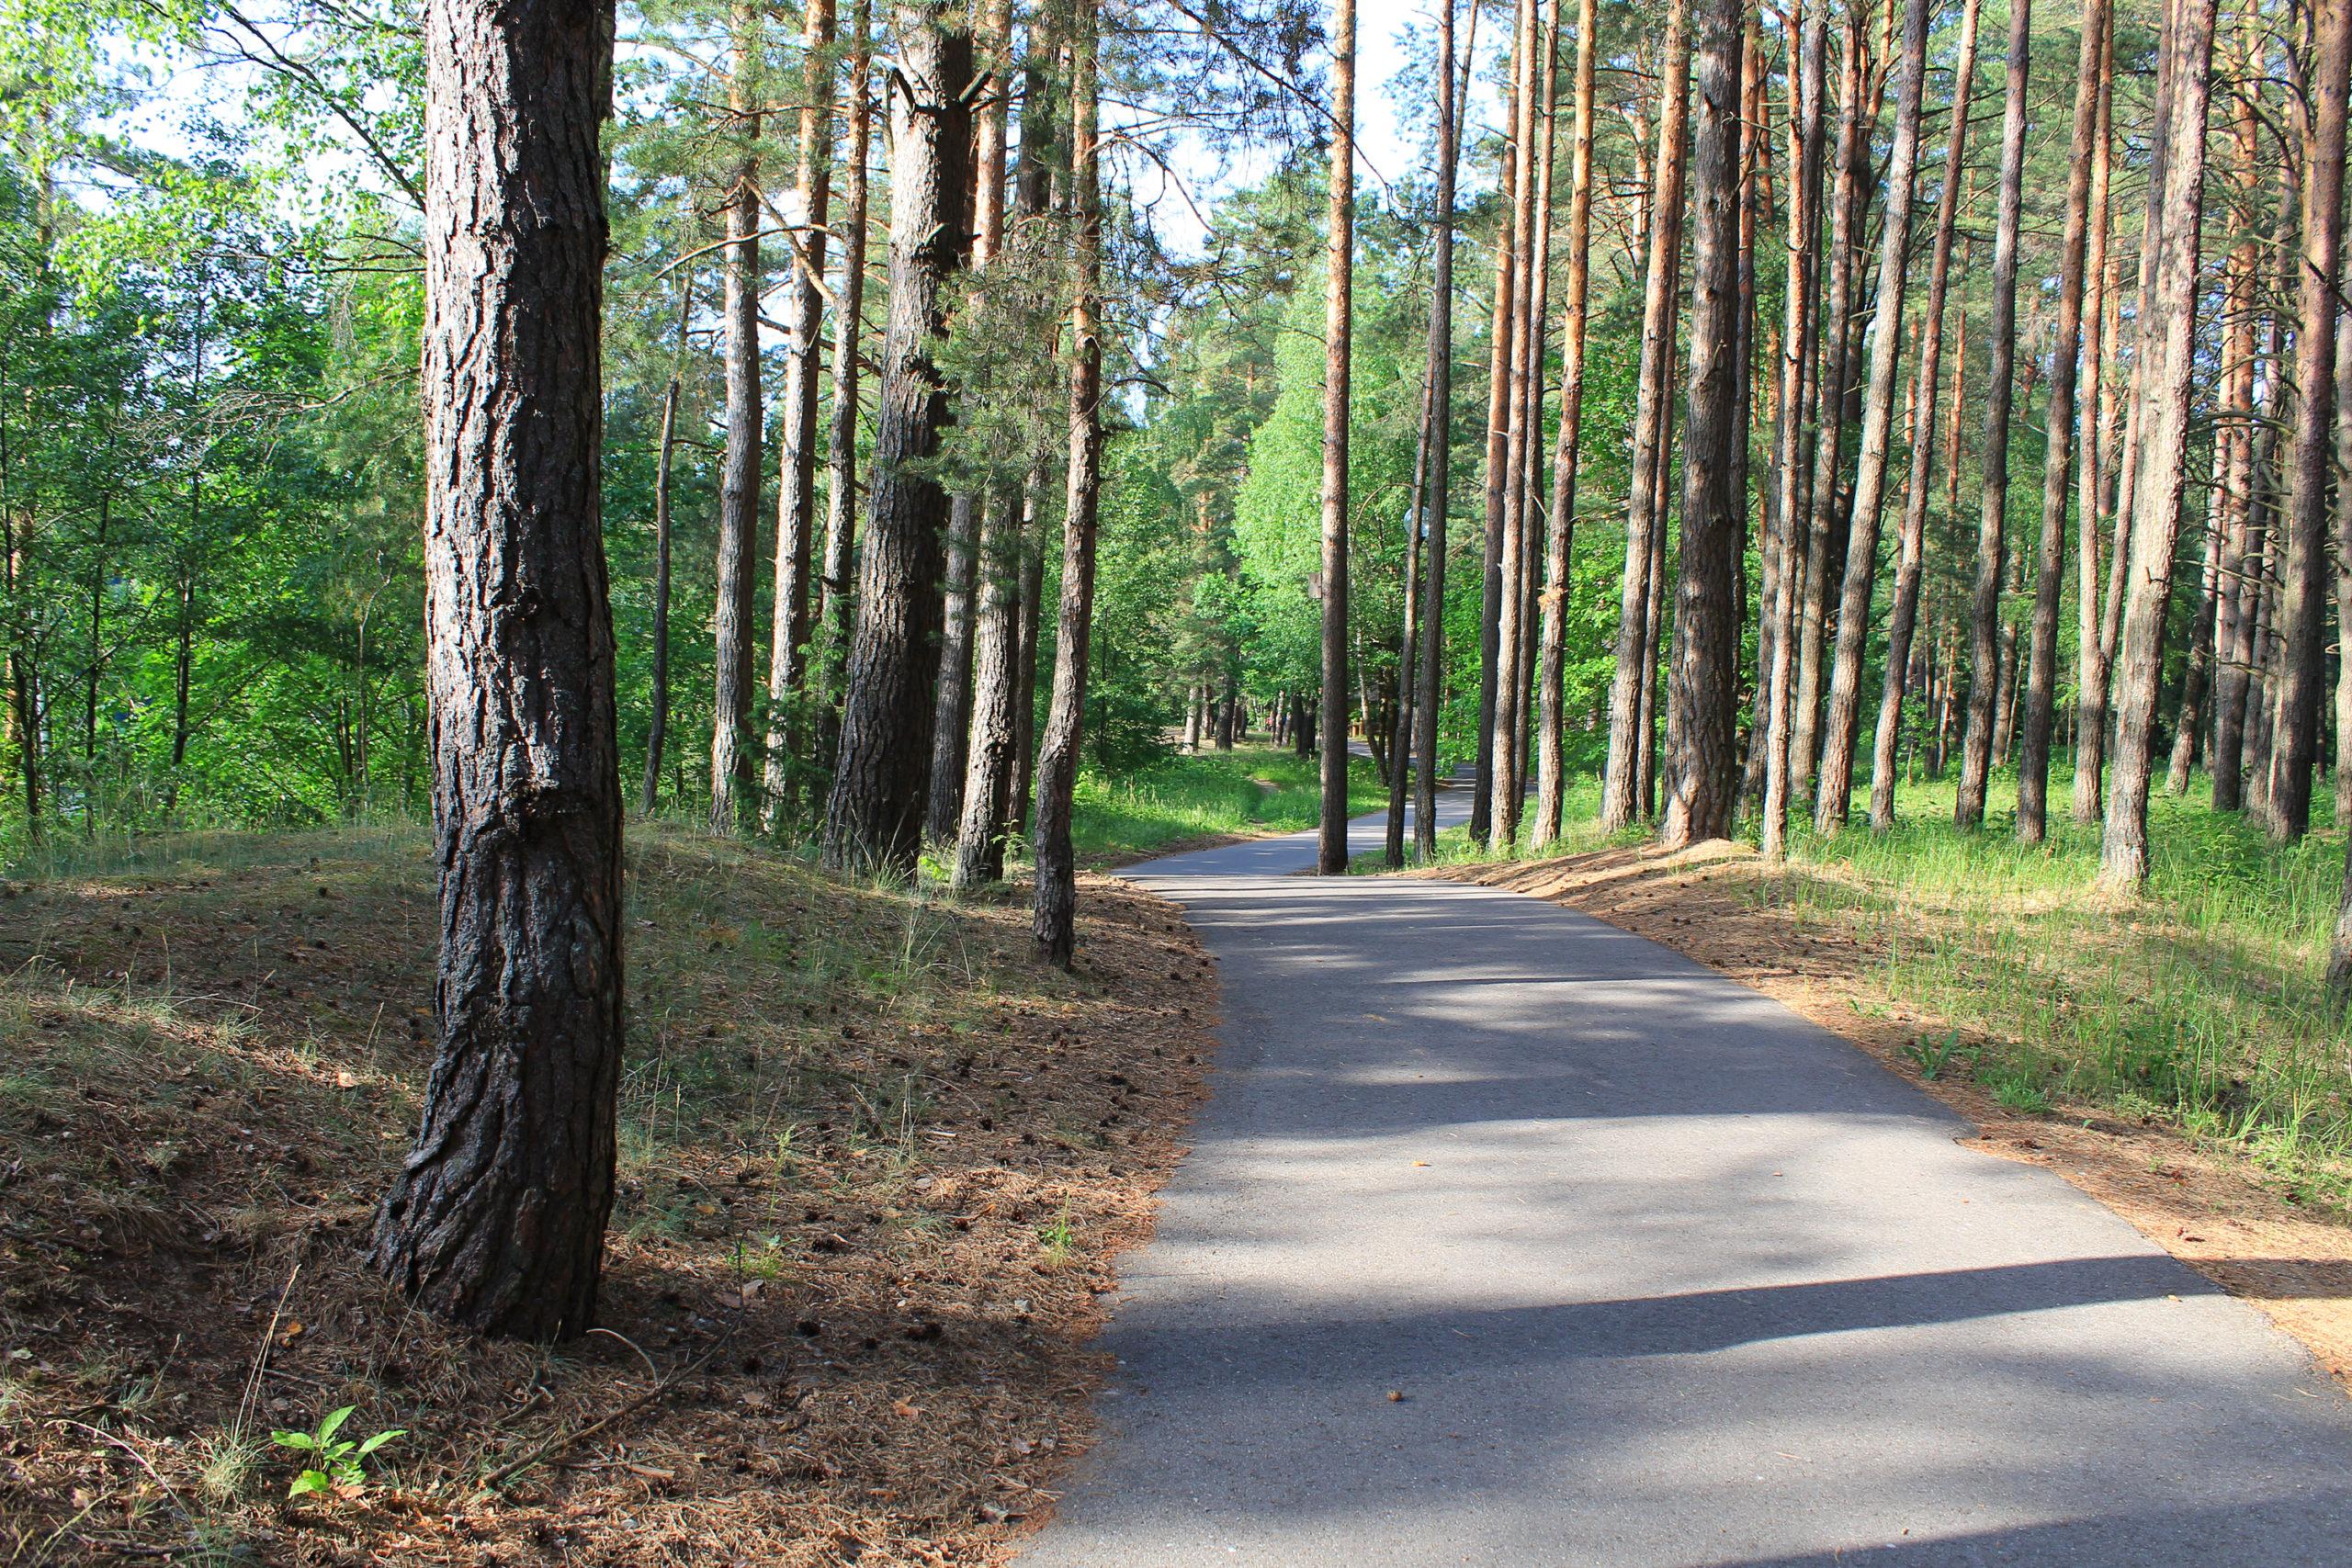 Droga w lesie sosnowym